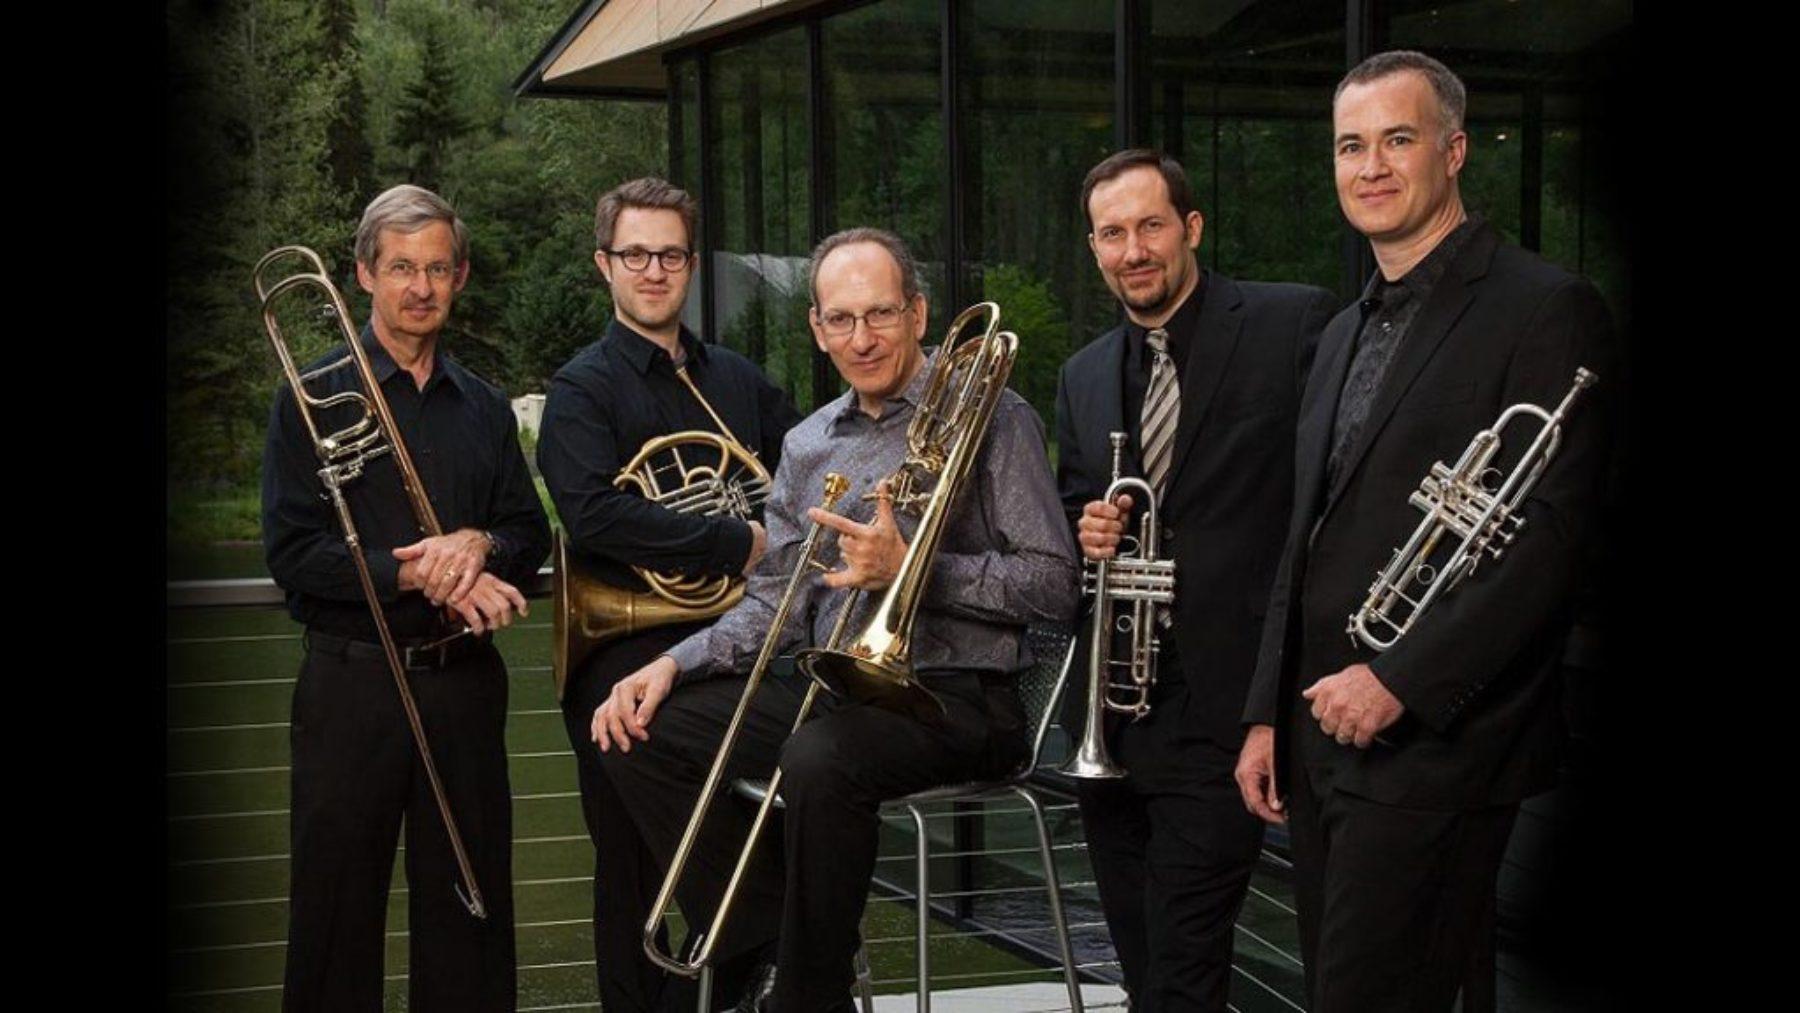 American Brass Quintet - Saturday, January 25, 2020, 4 p.m.